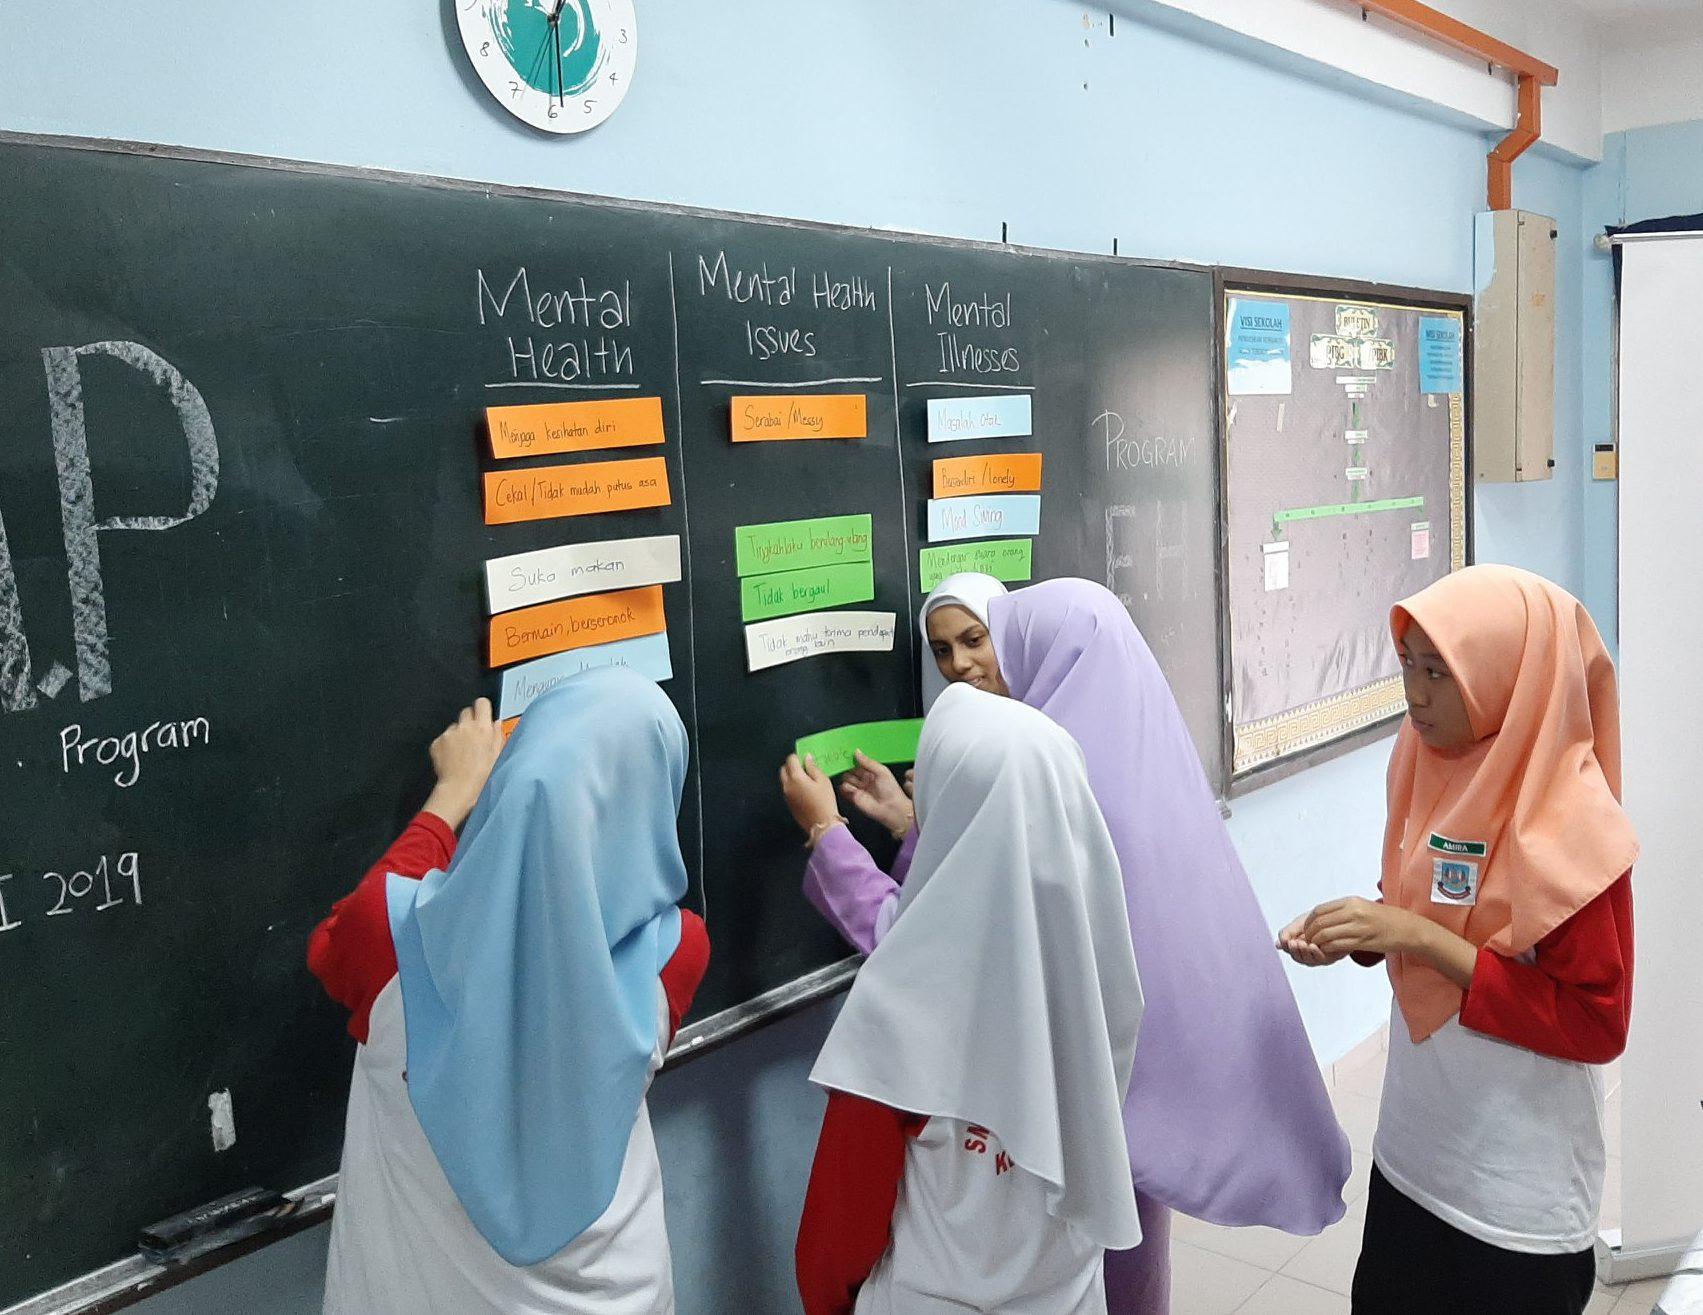 Kl Teachers To Undergo Mental Health First Aid Training Twentytwo13 My